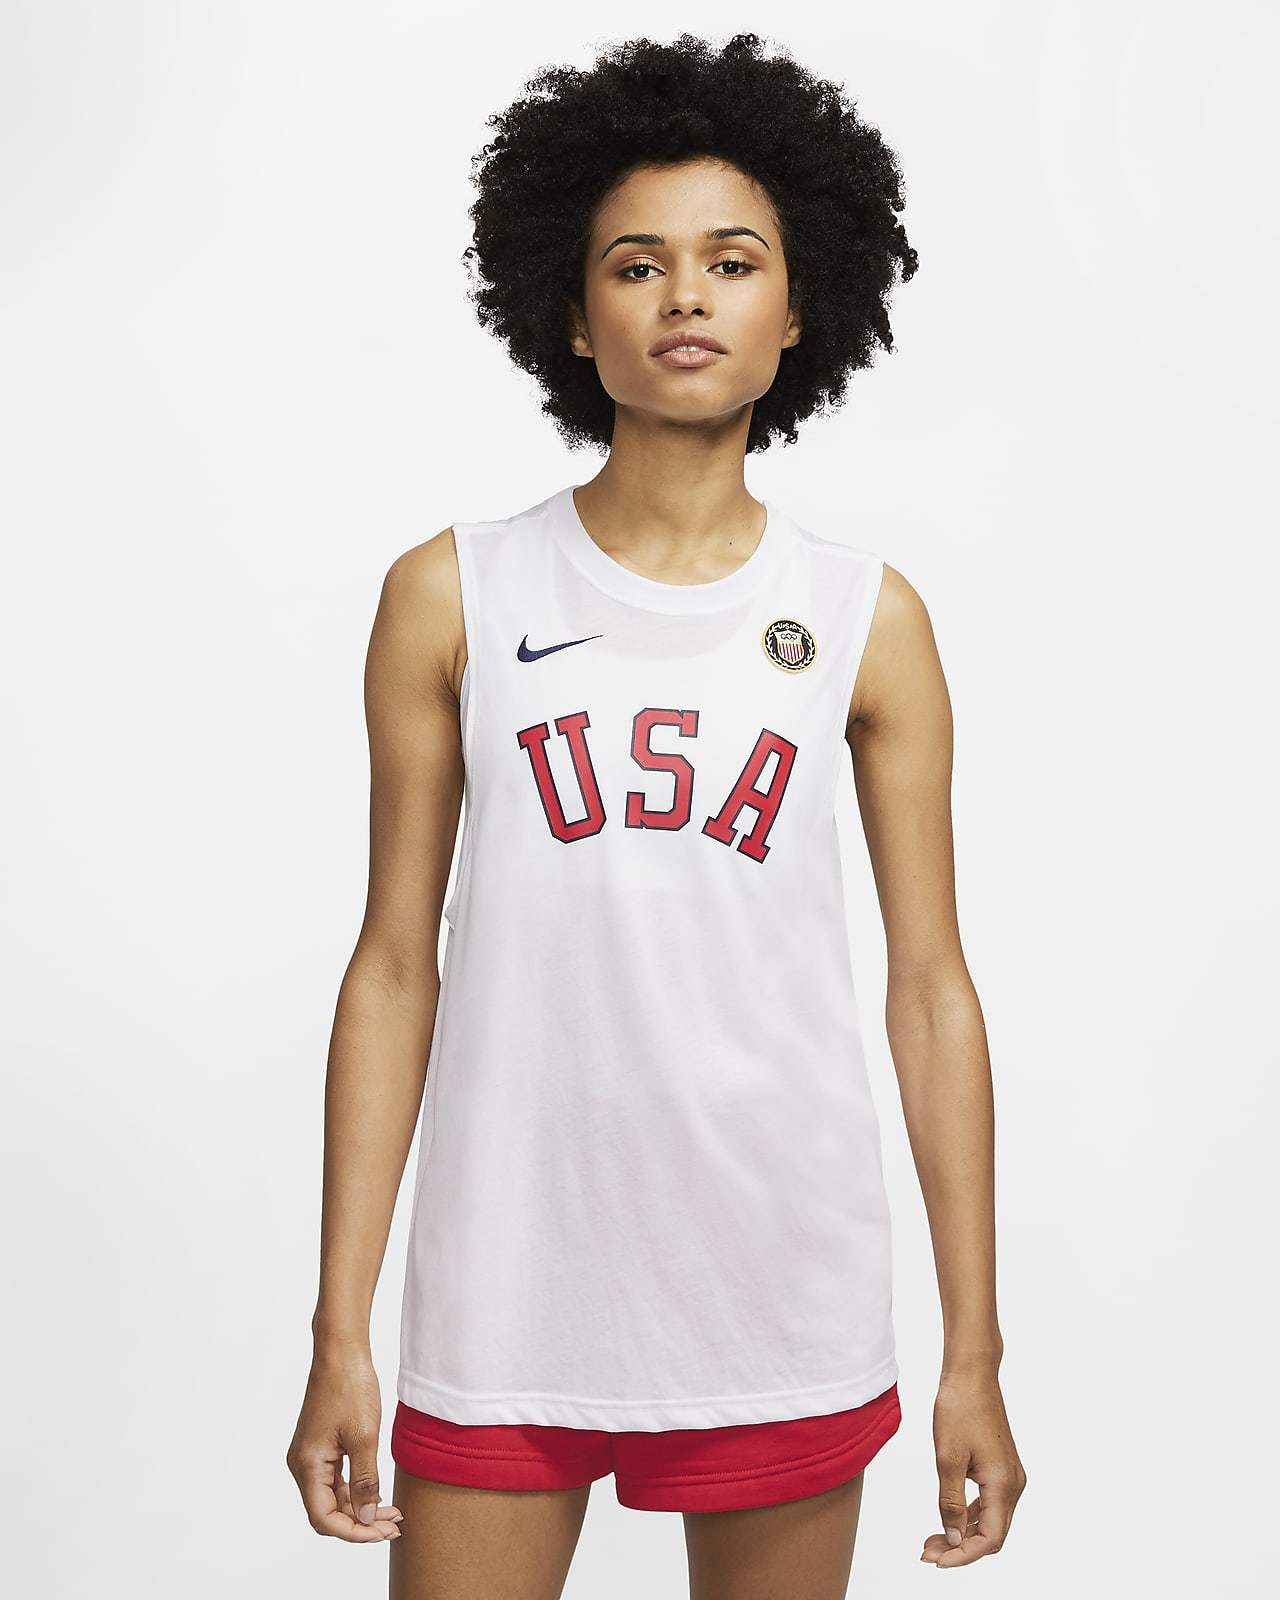 Nike Dri-FIT Team USA Women's Training Tank